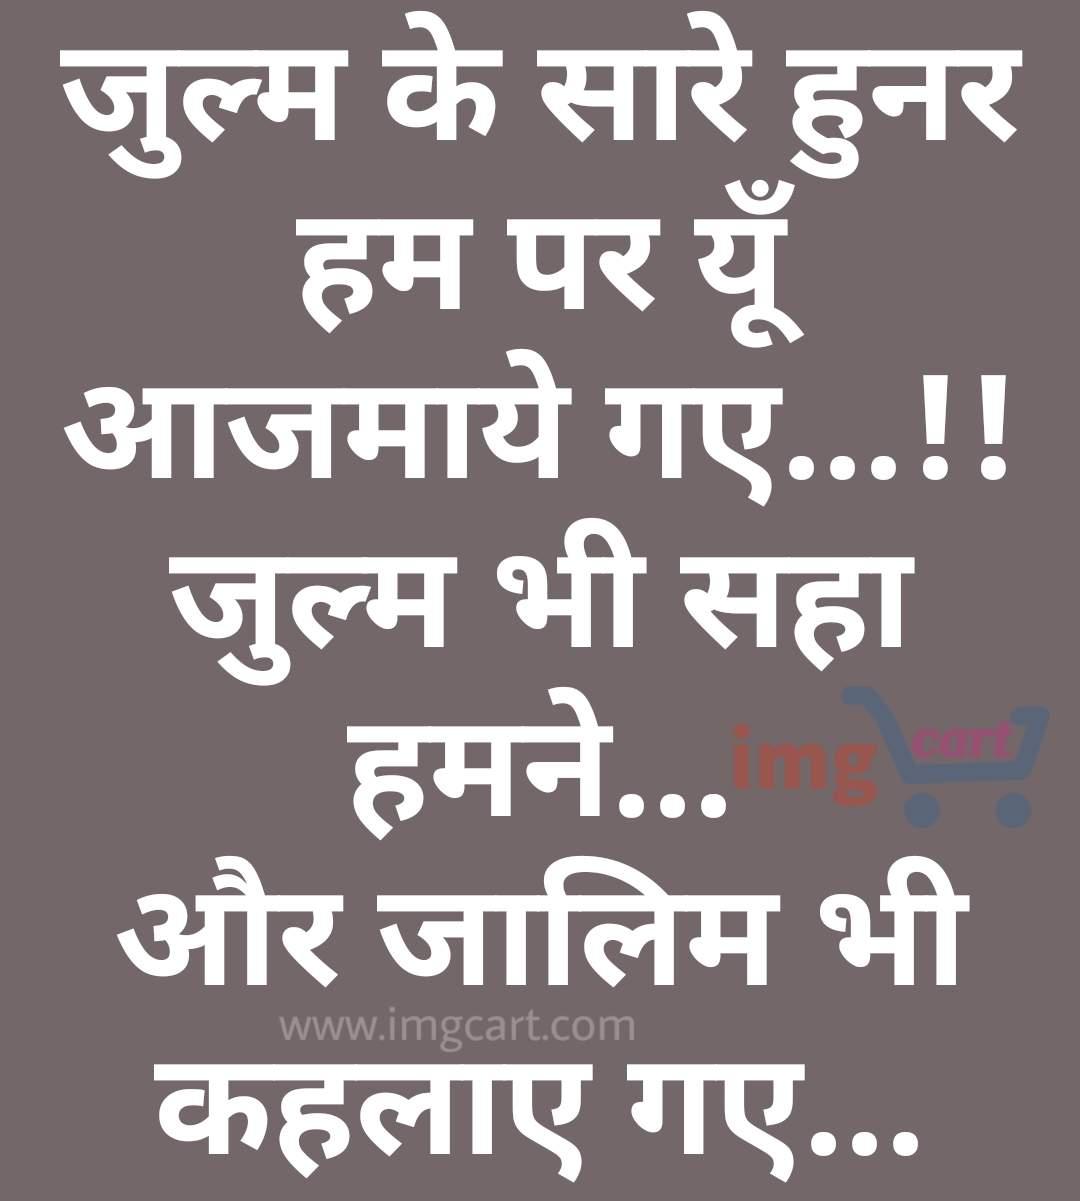 Download 30 Whatsapp Status Image In Hindi Status Image